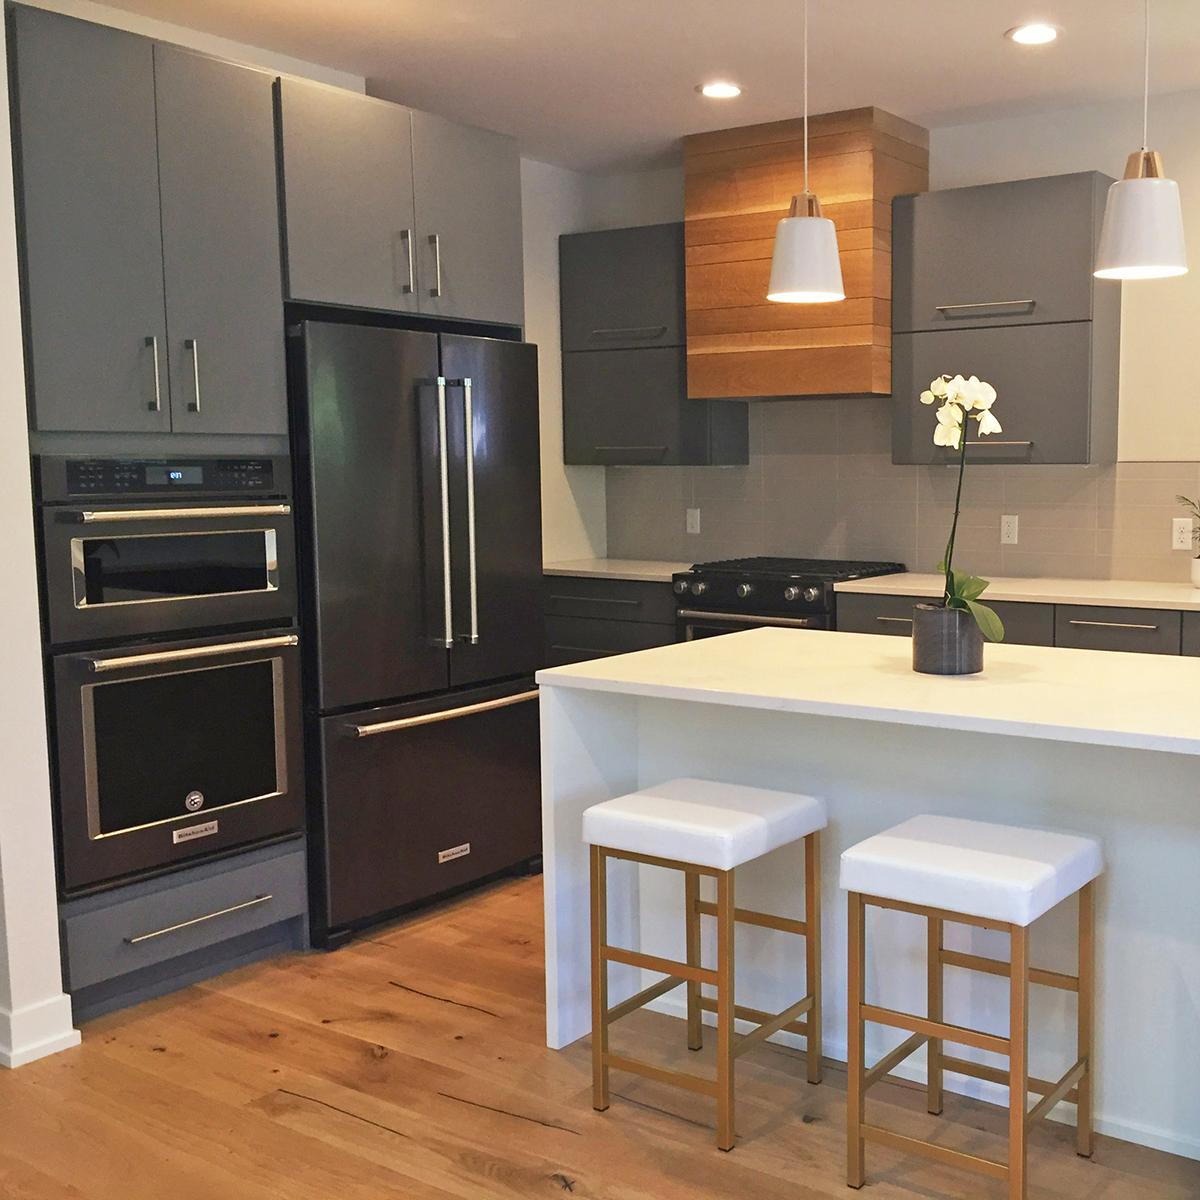 Maple Cabinets Merillat Dusk: BJ Tidwell Cabinets From Advanced Interiors